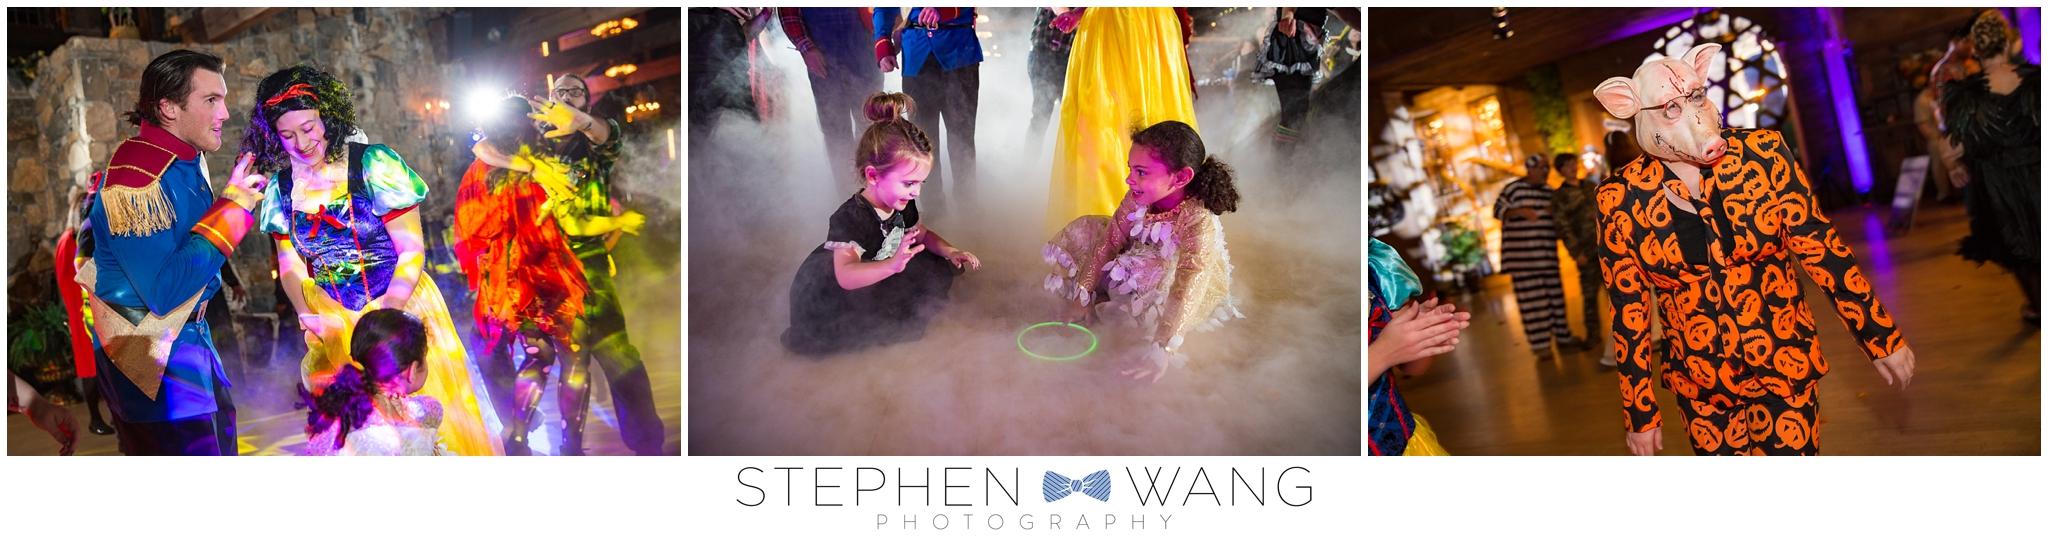 Stephen Wang Photography Wedding Connecticut CT Bill Miller's Castle Branford CT Halloween New England Wedding New Haven-12-02_0030.jpg